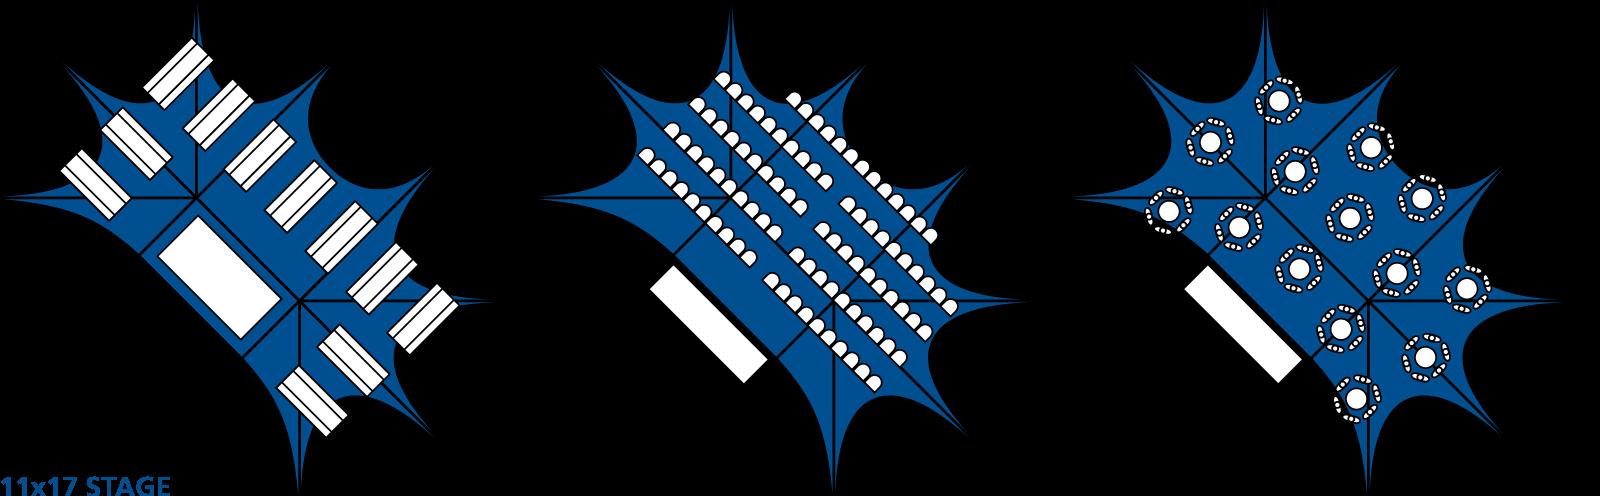 sternzelt jh static 11x17 bestuhlung